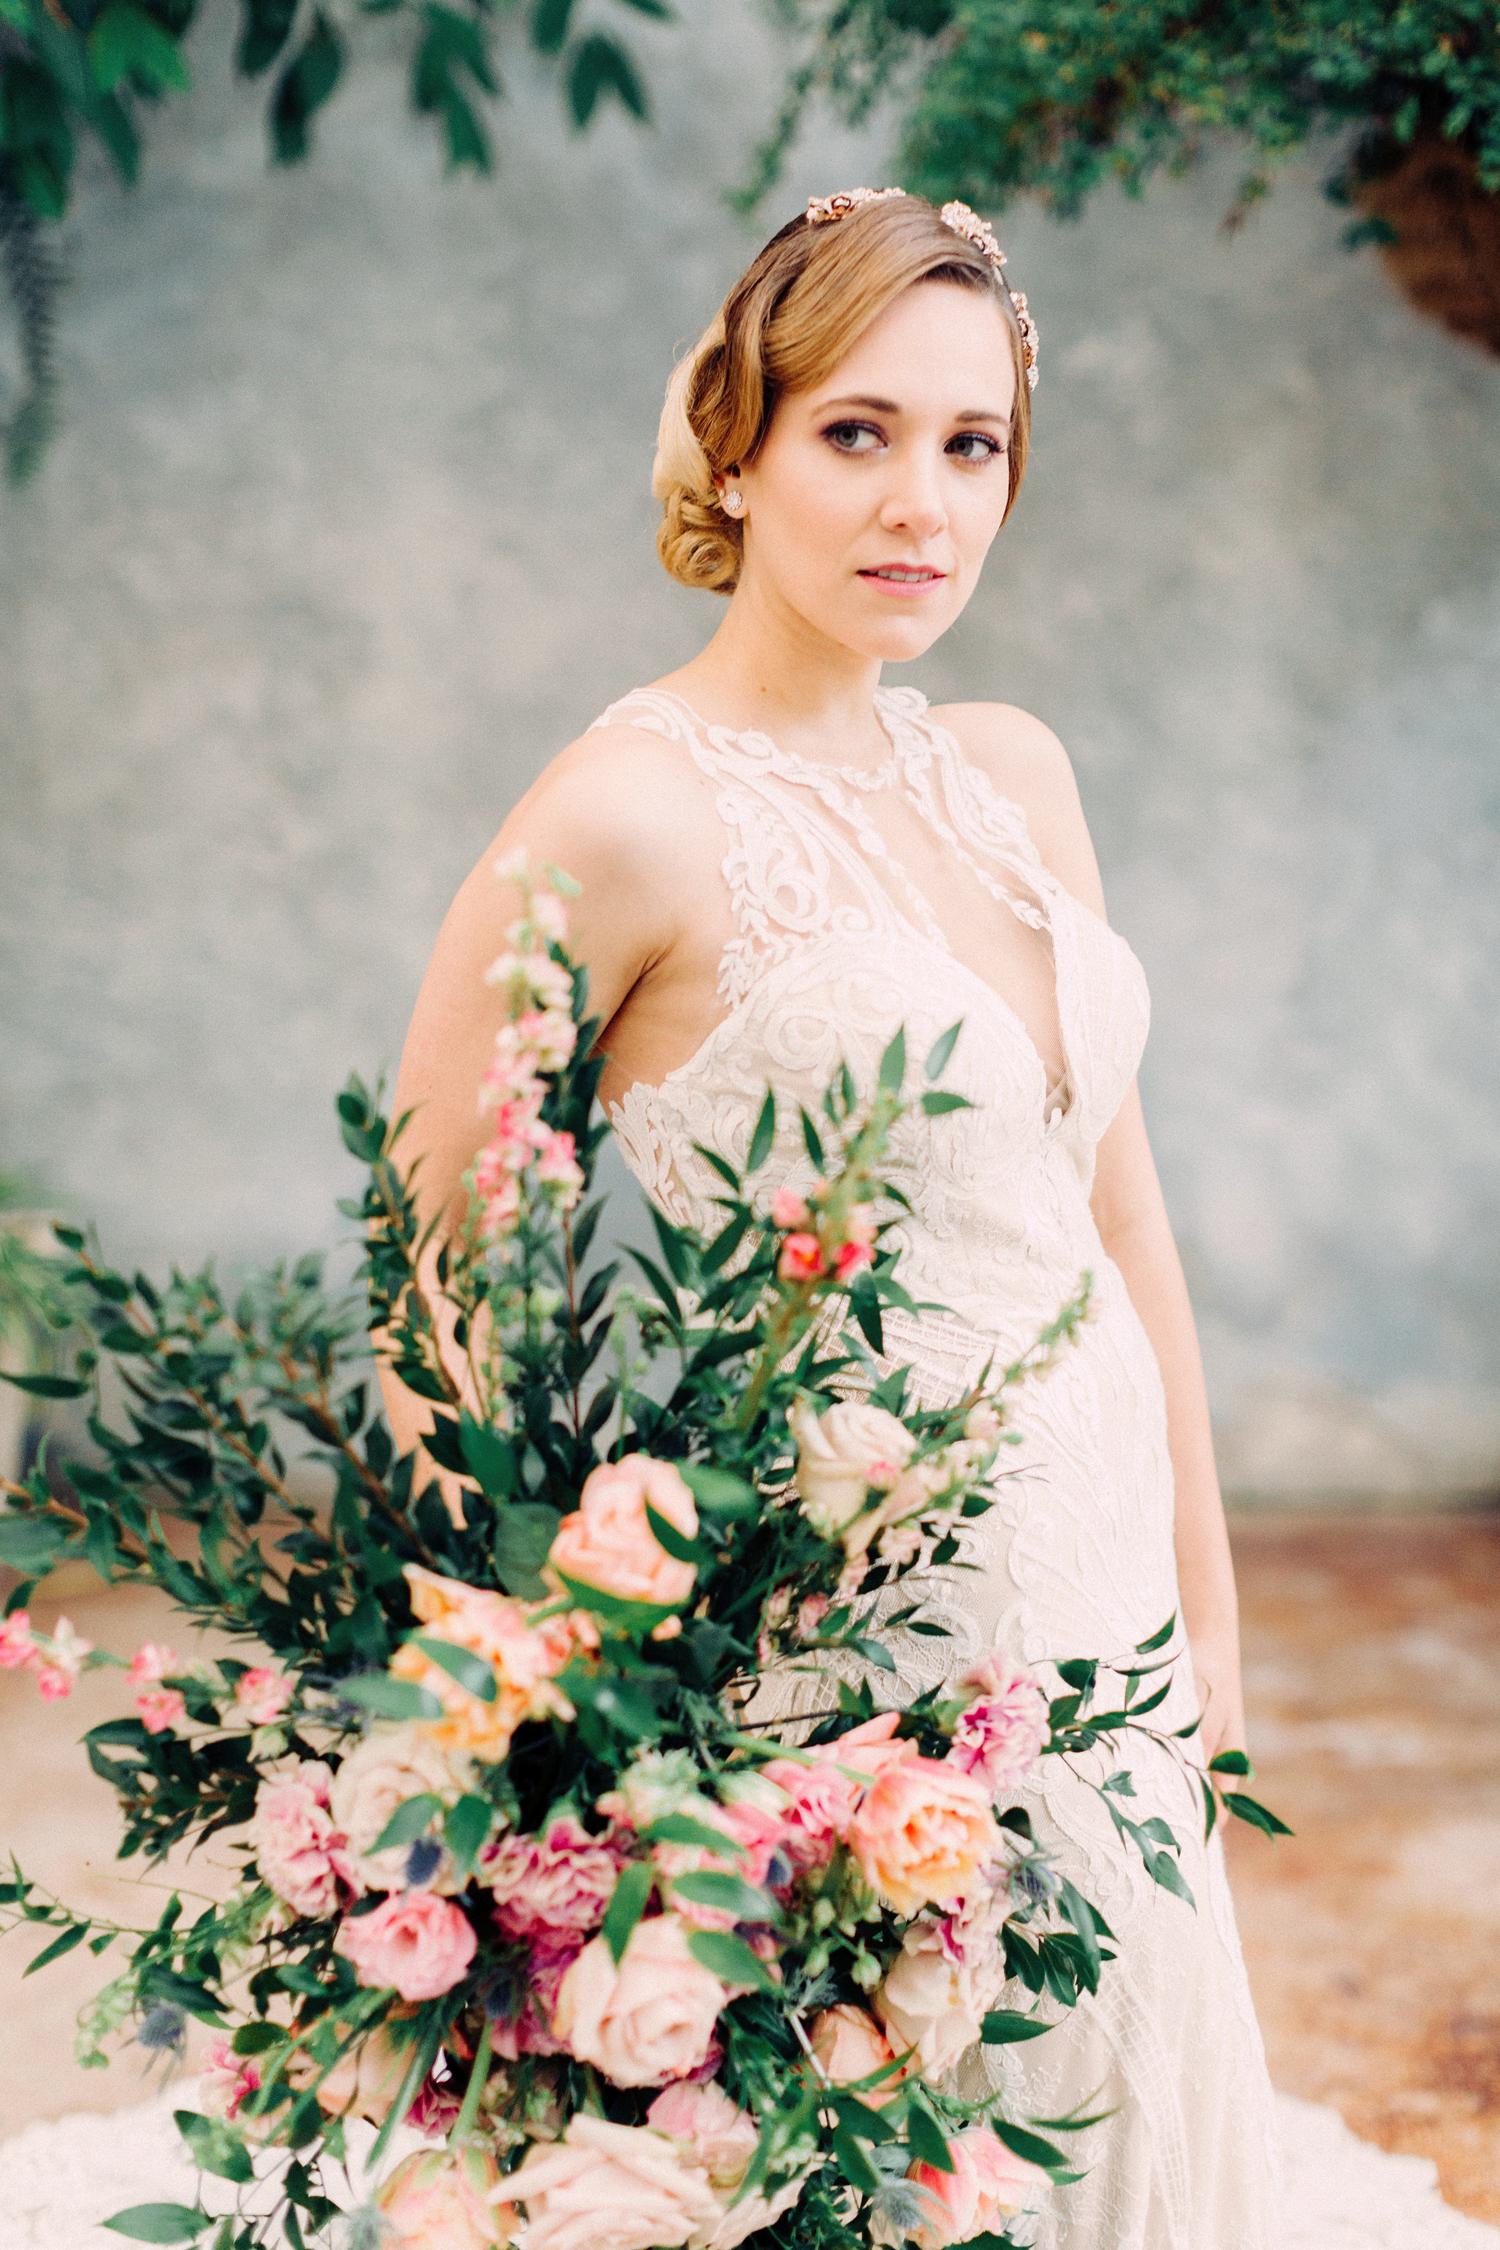 031-alaamarzouk-alaamarzoukphotography-mcallenweddingphotographer-alaa-marzouk-mcallen-mission-wedding-texas-venue-photography-wedding-california-bride-bridal-engagement-austin-elopement.jpg